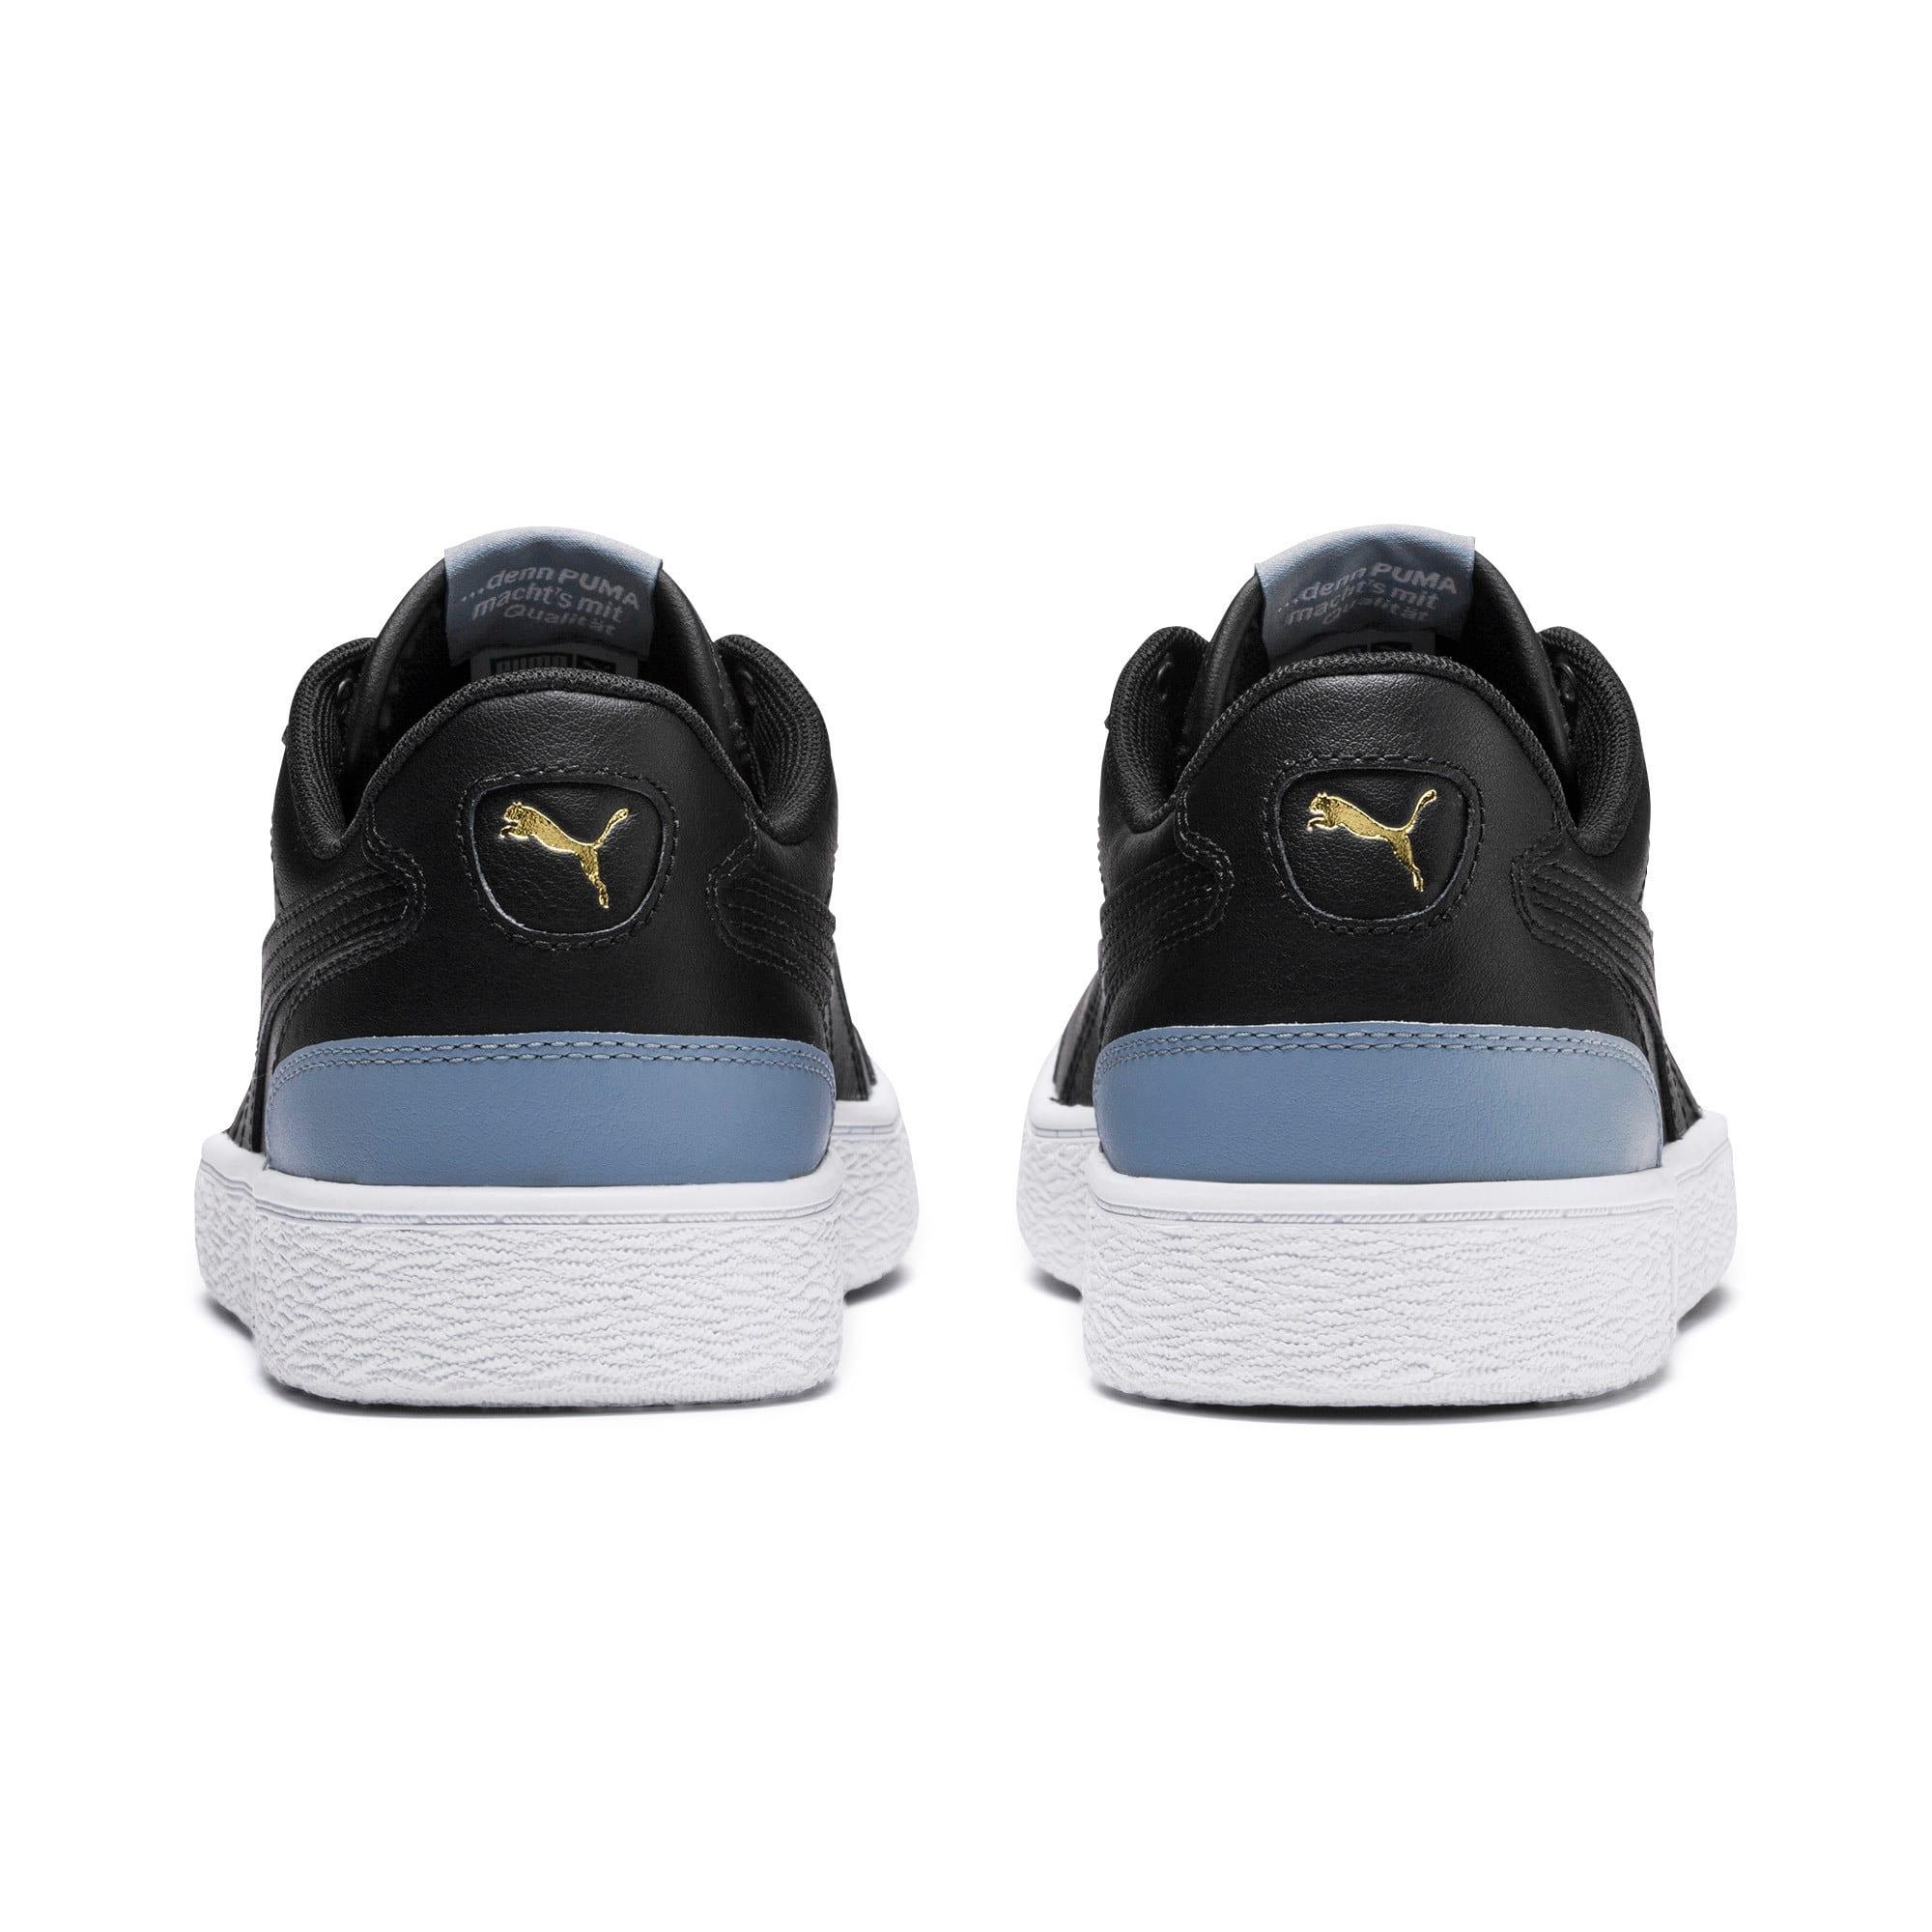 Miniatura 3 de Zapatos deportivosRalph Sampson Lo, Puma Blk-Puma Blk-FadedDenim, mediano